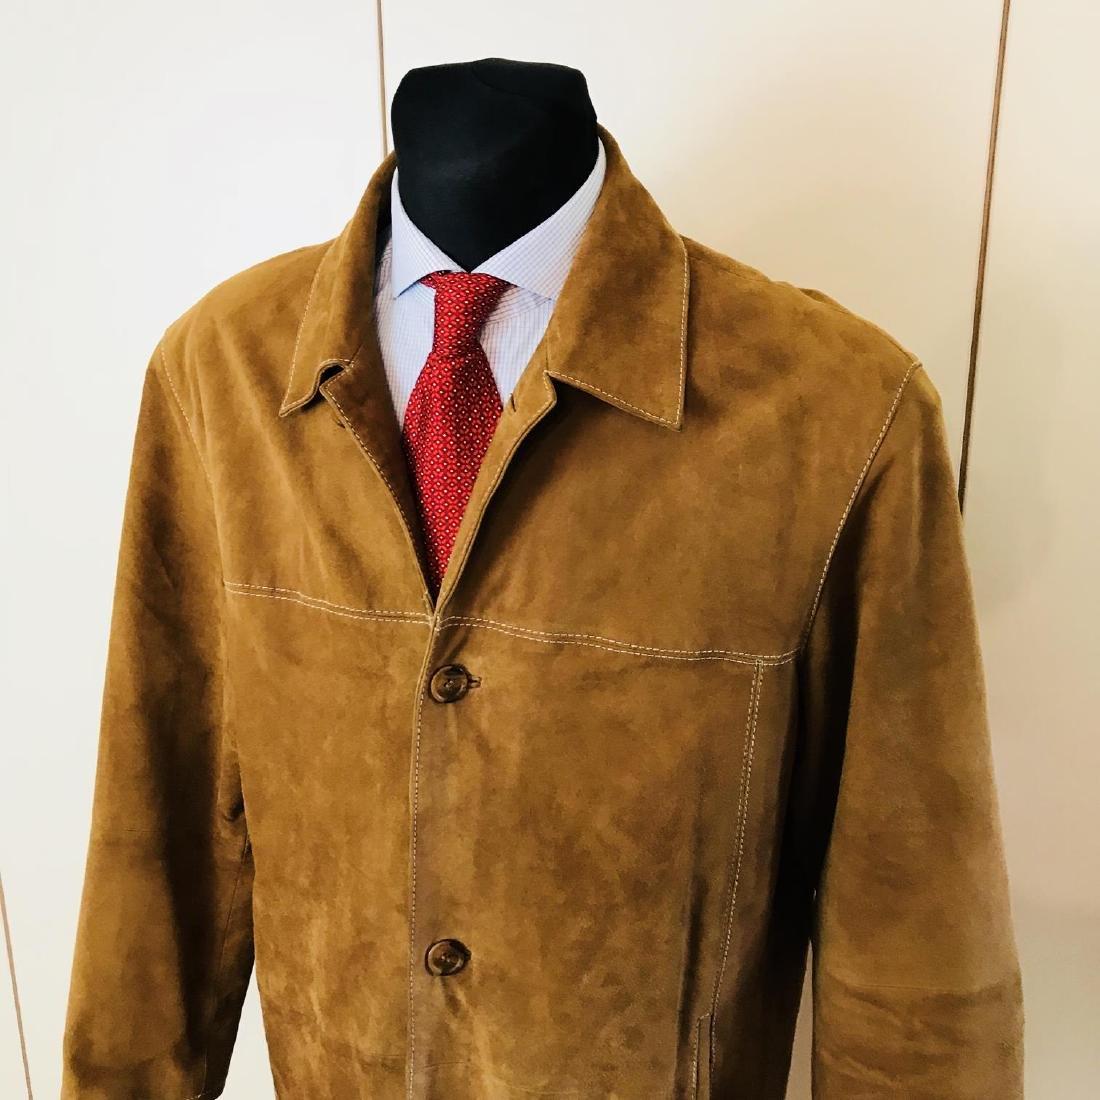 Vintage Men's Brown Suede Leather Jacket Coat Size 40 - 2